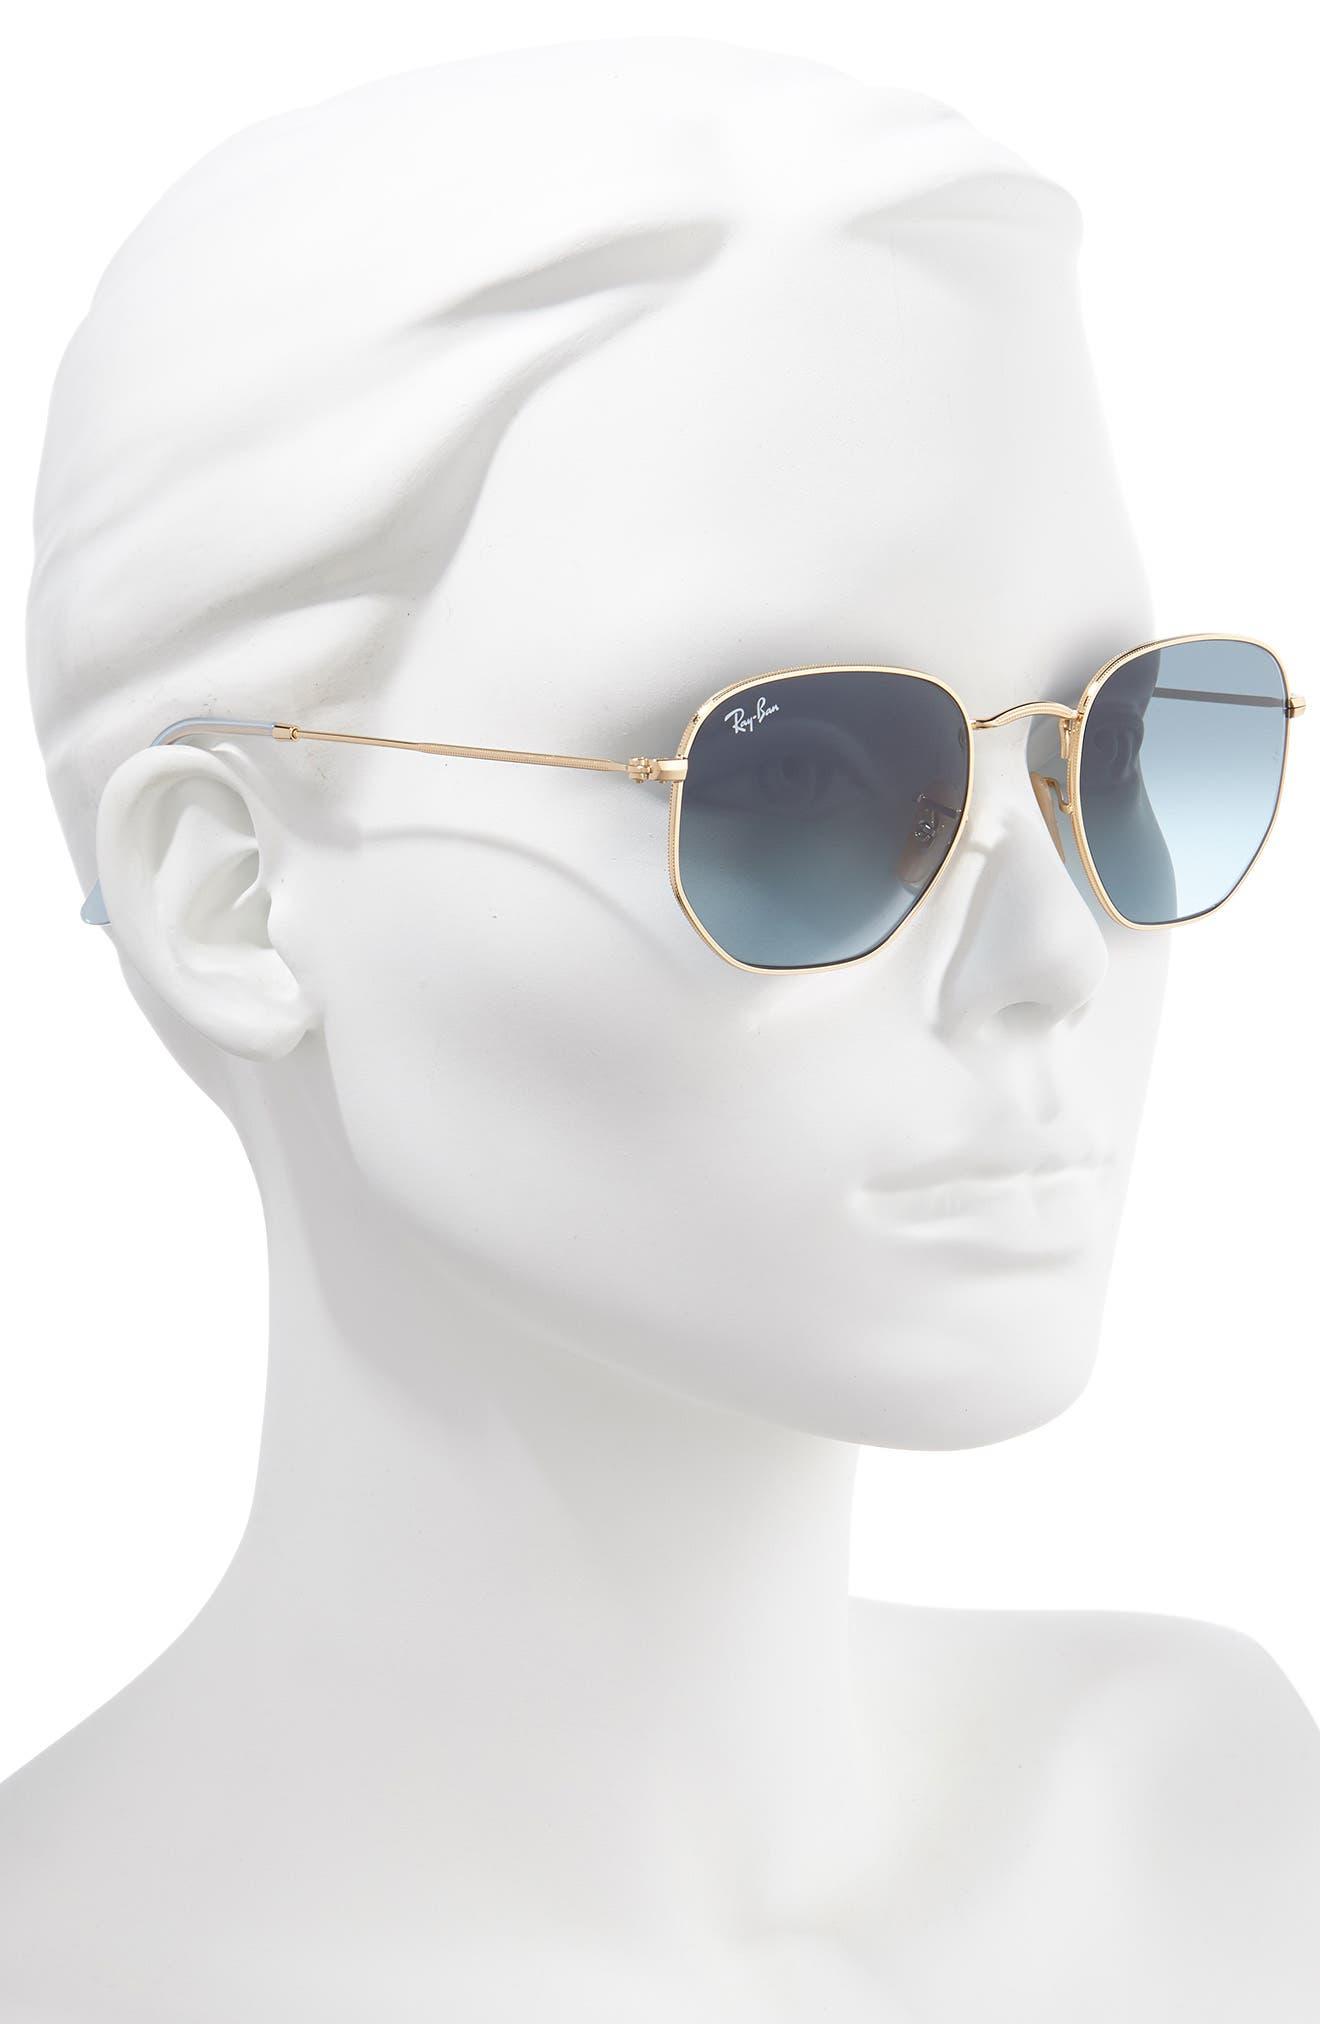 Ray-Ban 51Mm Aviator Sunglasses - Gold/ Blue Gradient